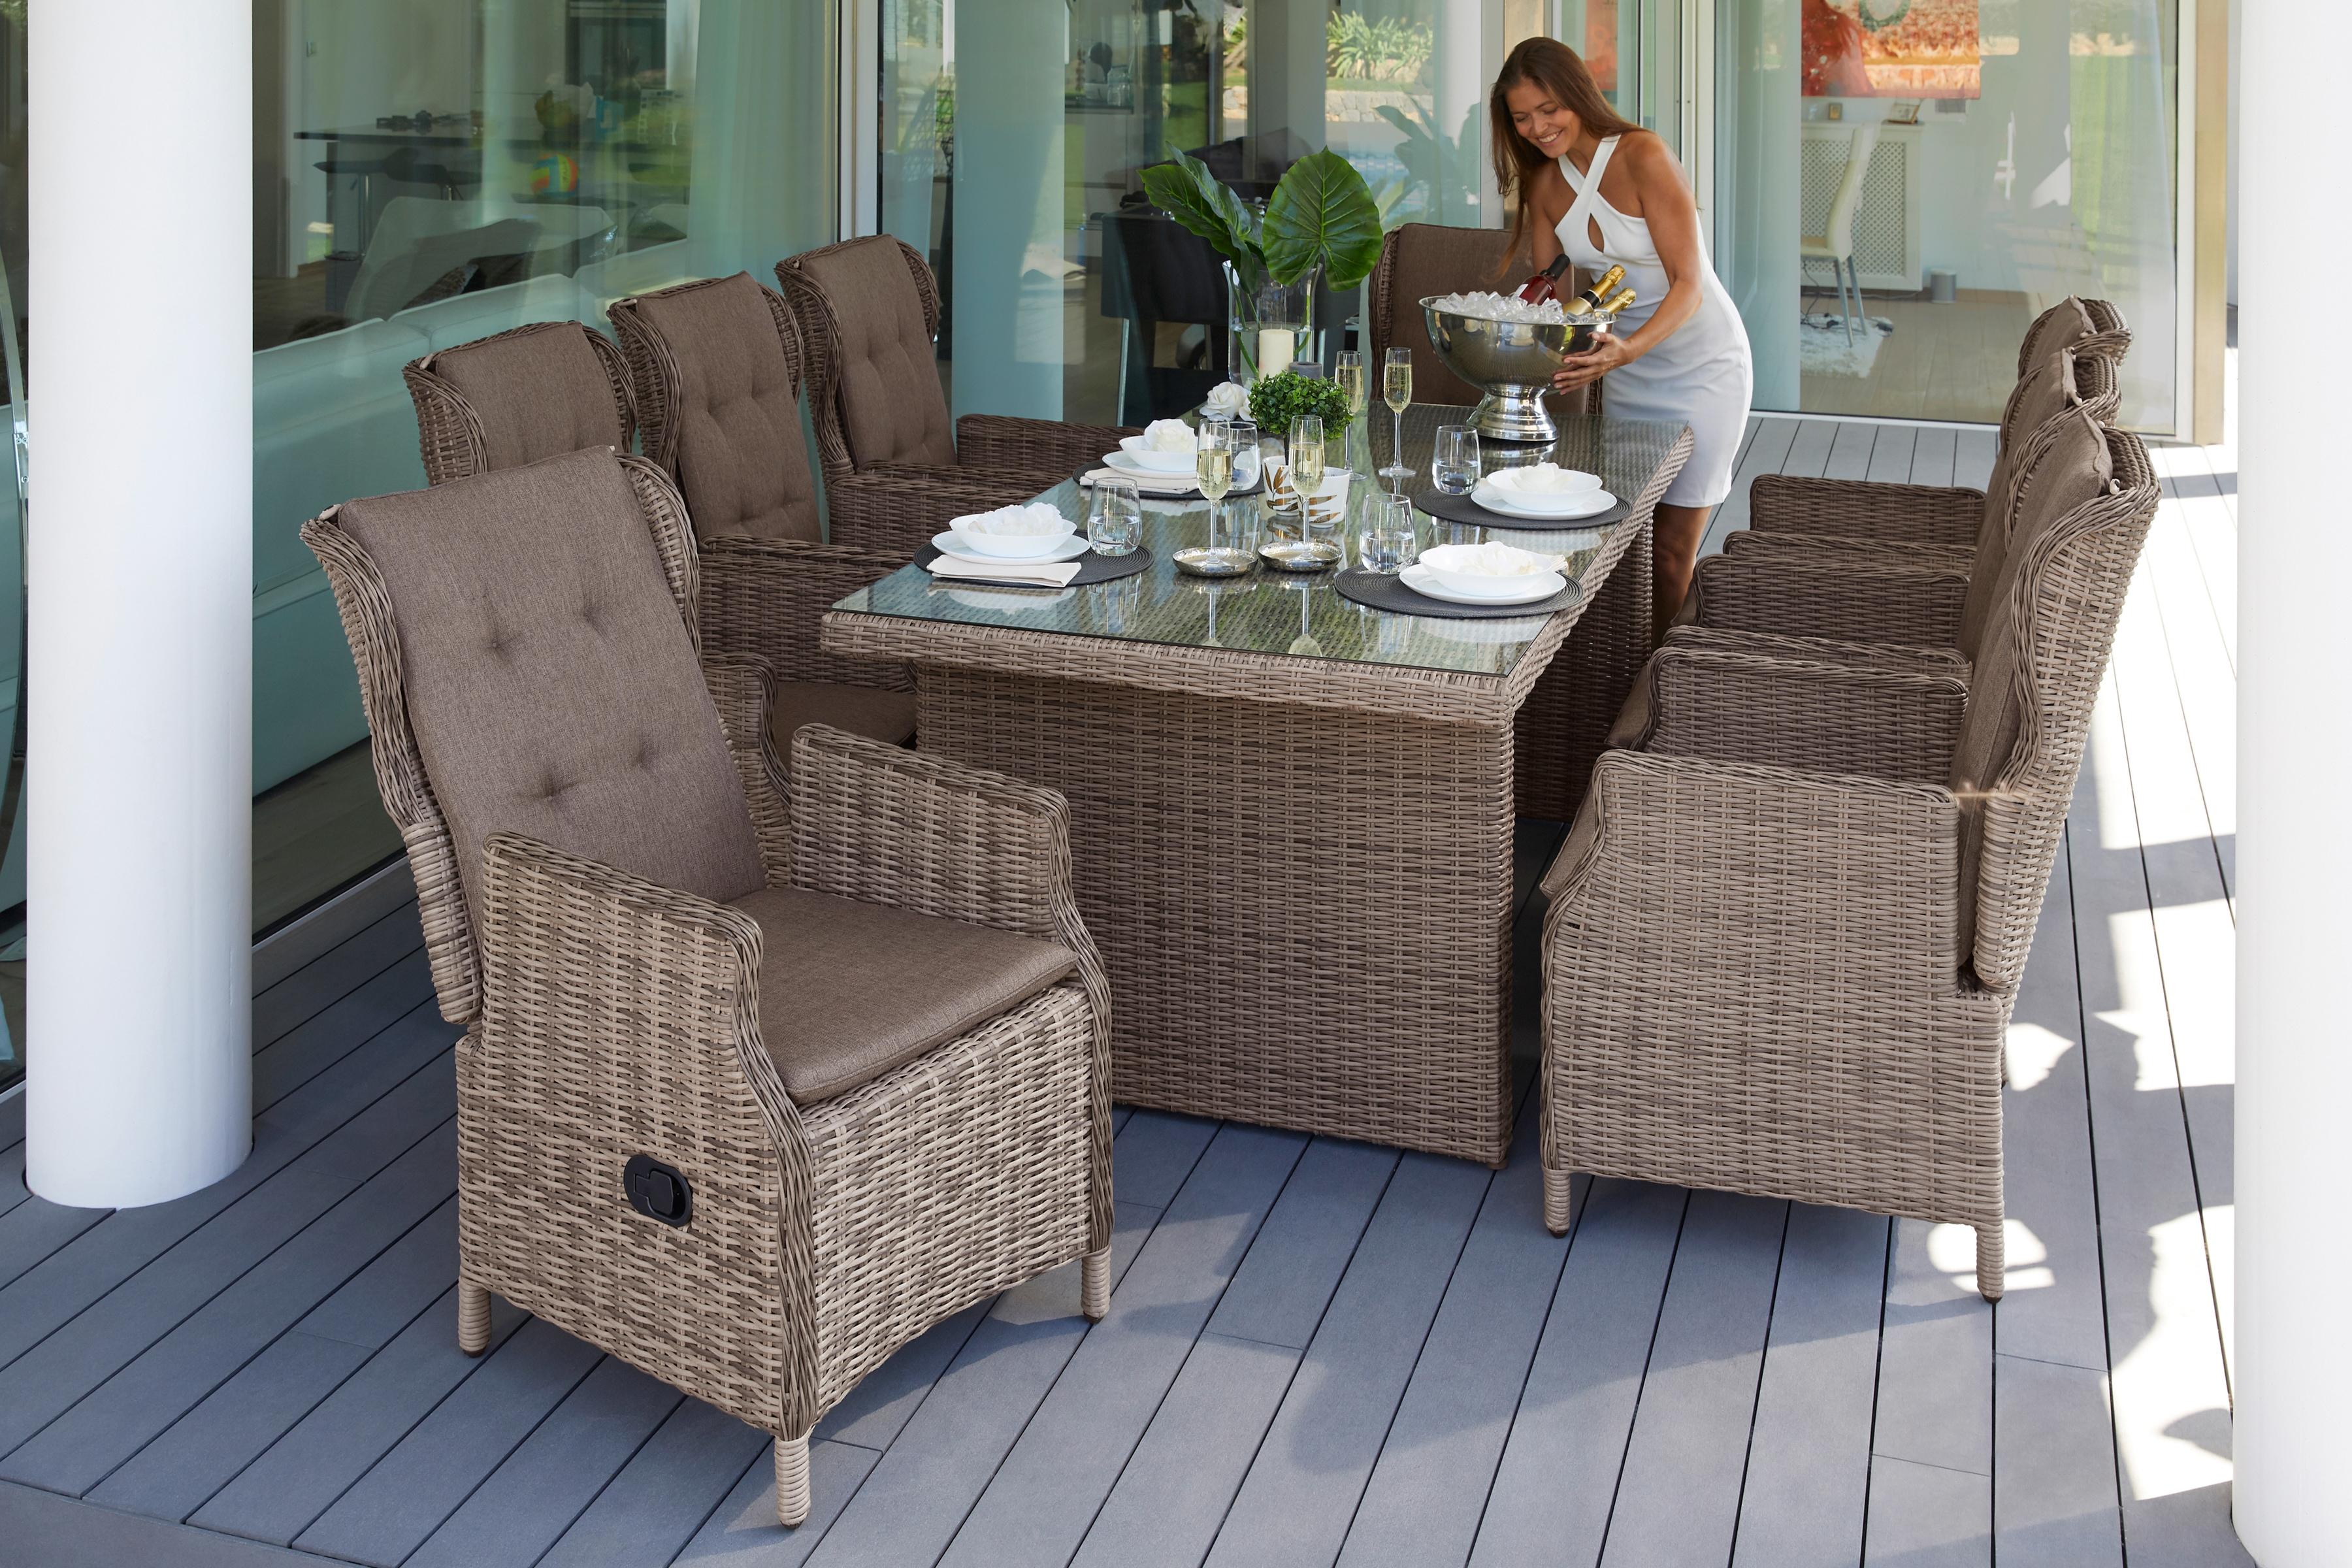 MERXX Gartenmöbelset Riviera 17-tlg 8 Sessel Tisch 200x100 cm Kunststoff/Stahl